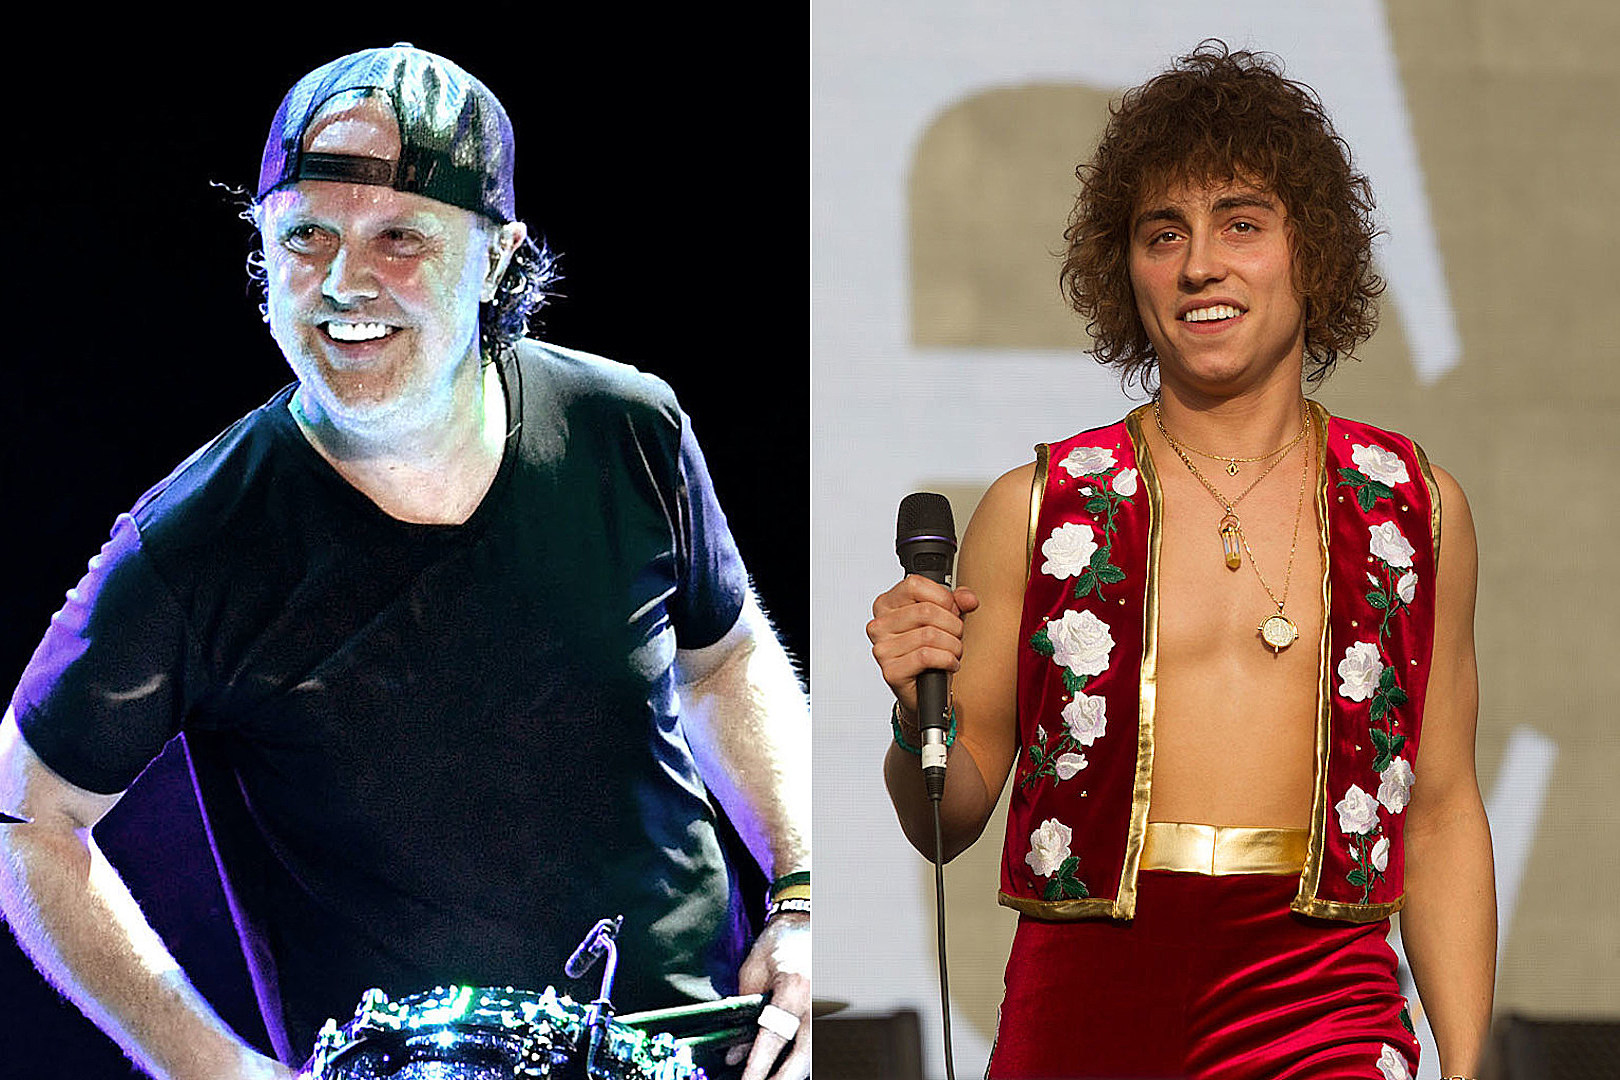 Metallica to Play Las Vegas Stadium With Greta Van Fleet in 2022